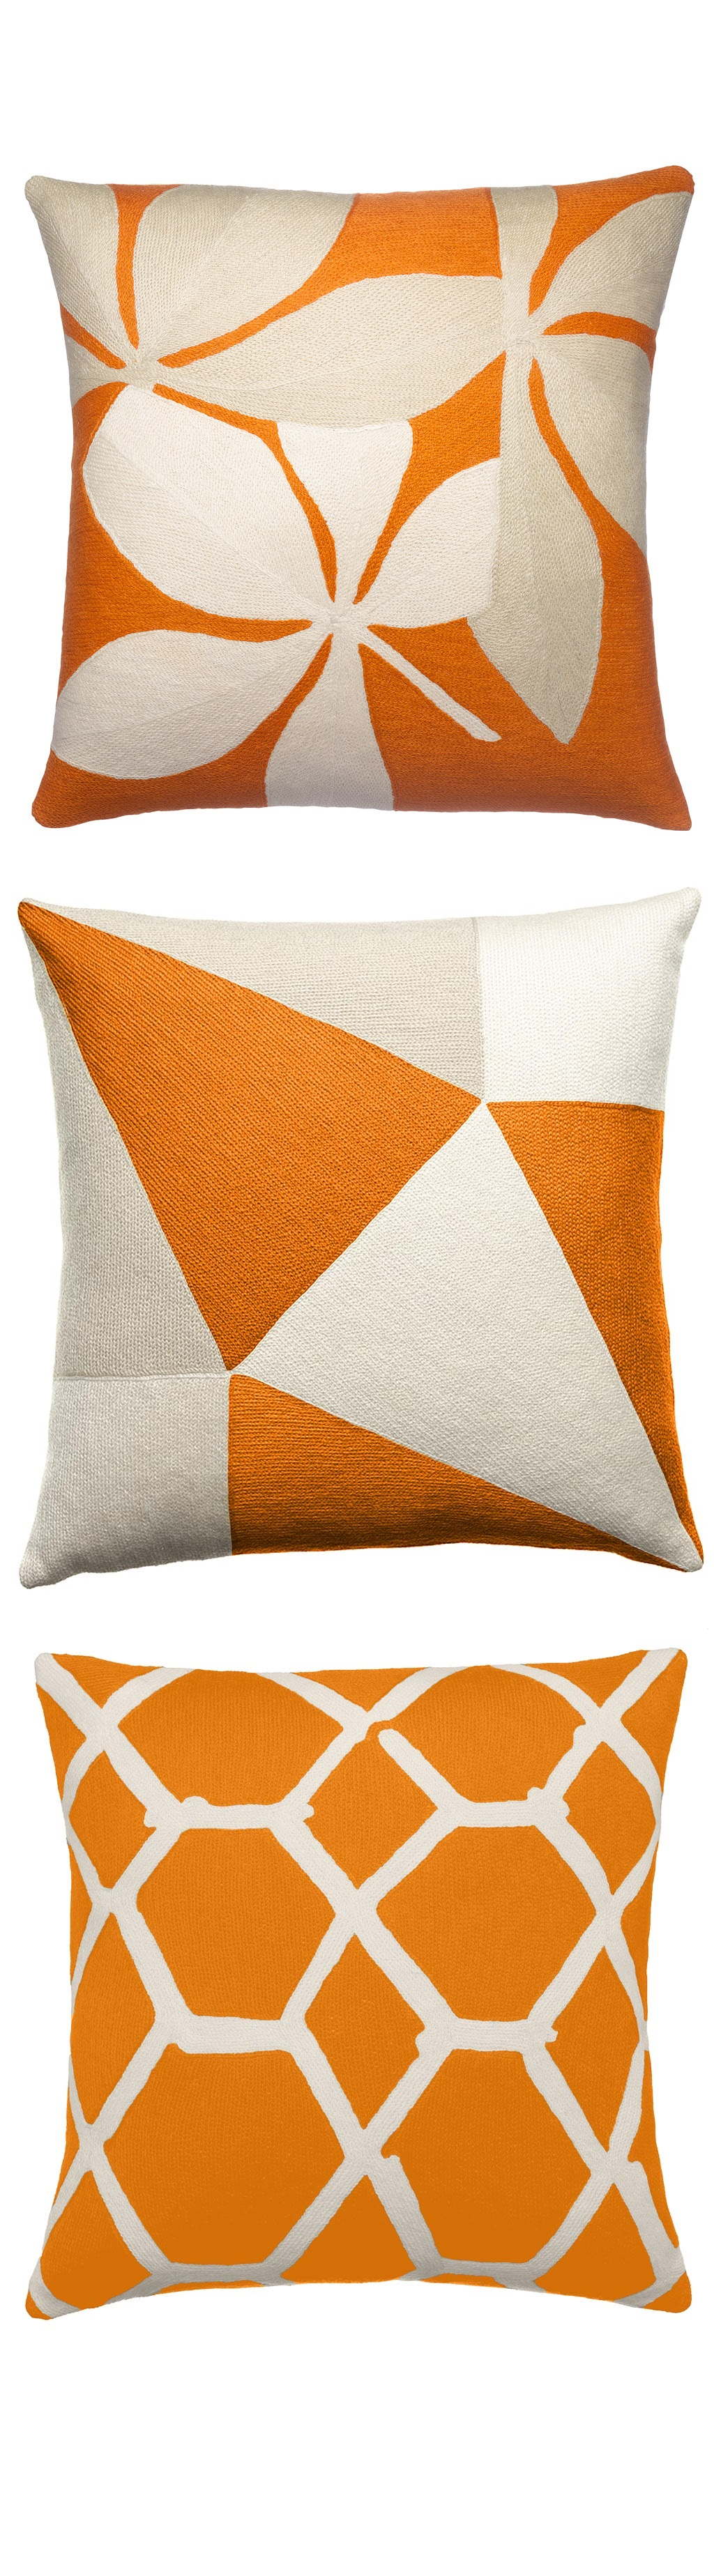 p orange htm furniture cor outdoor comfortable pillows d pillow throw majestic home plush